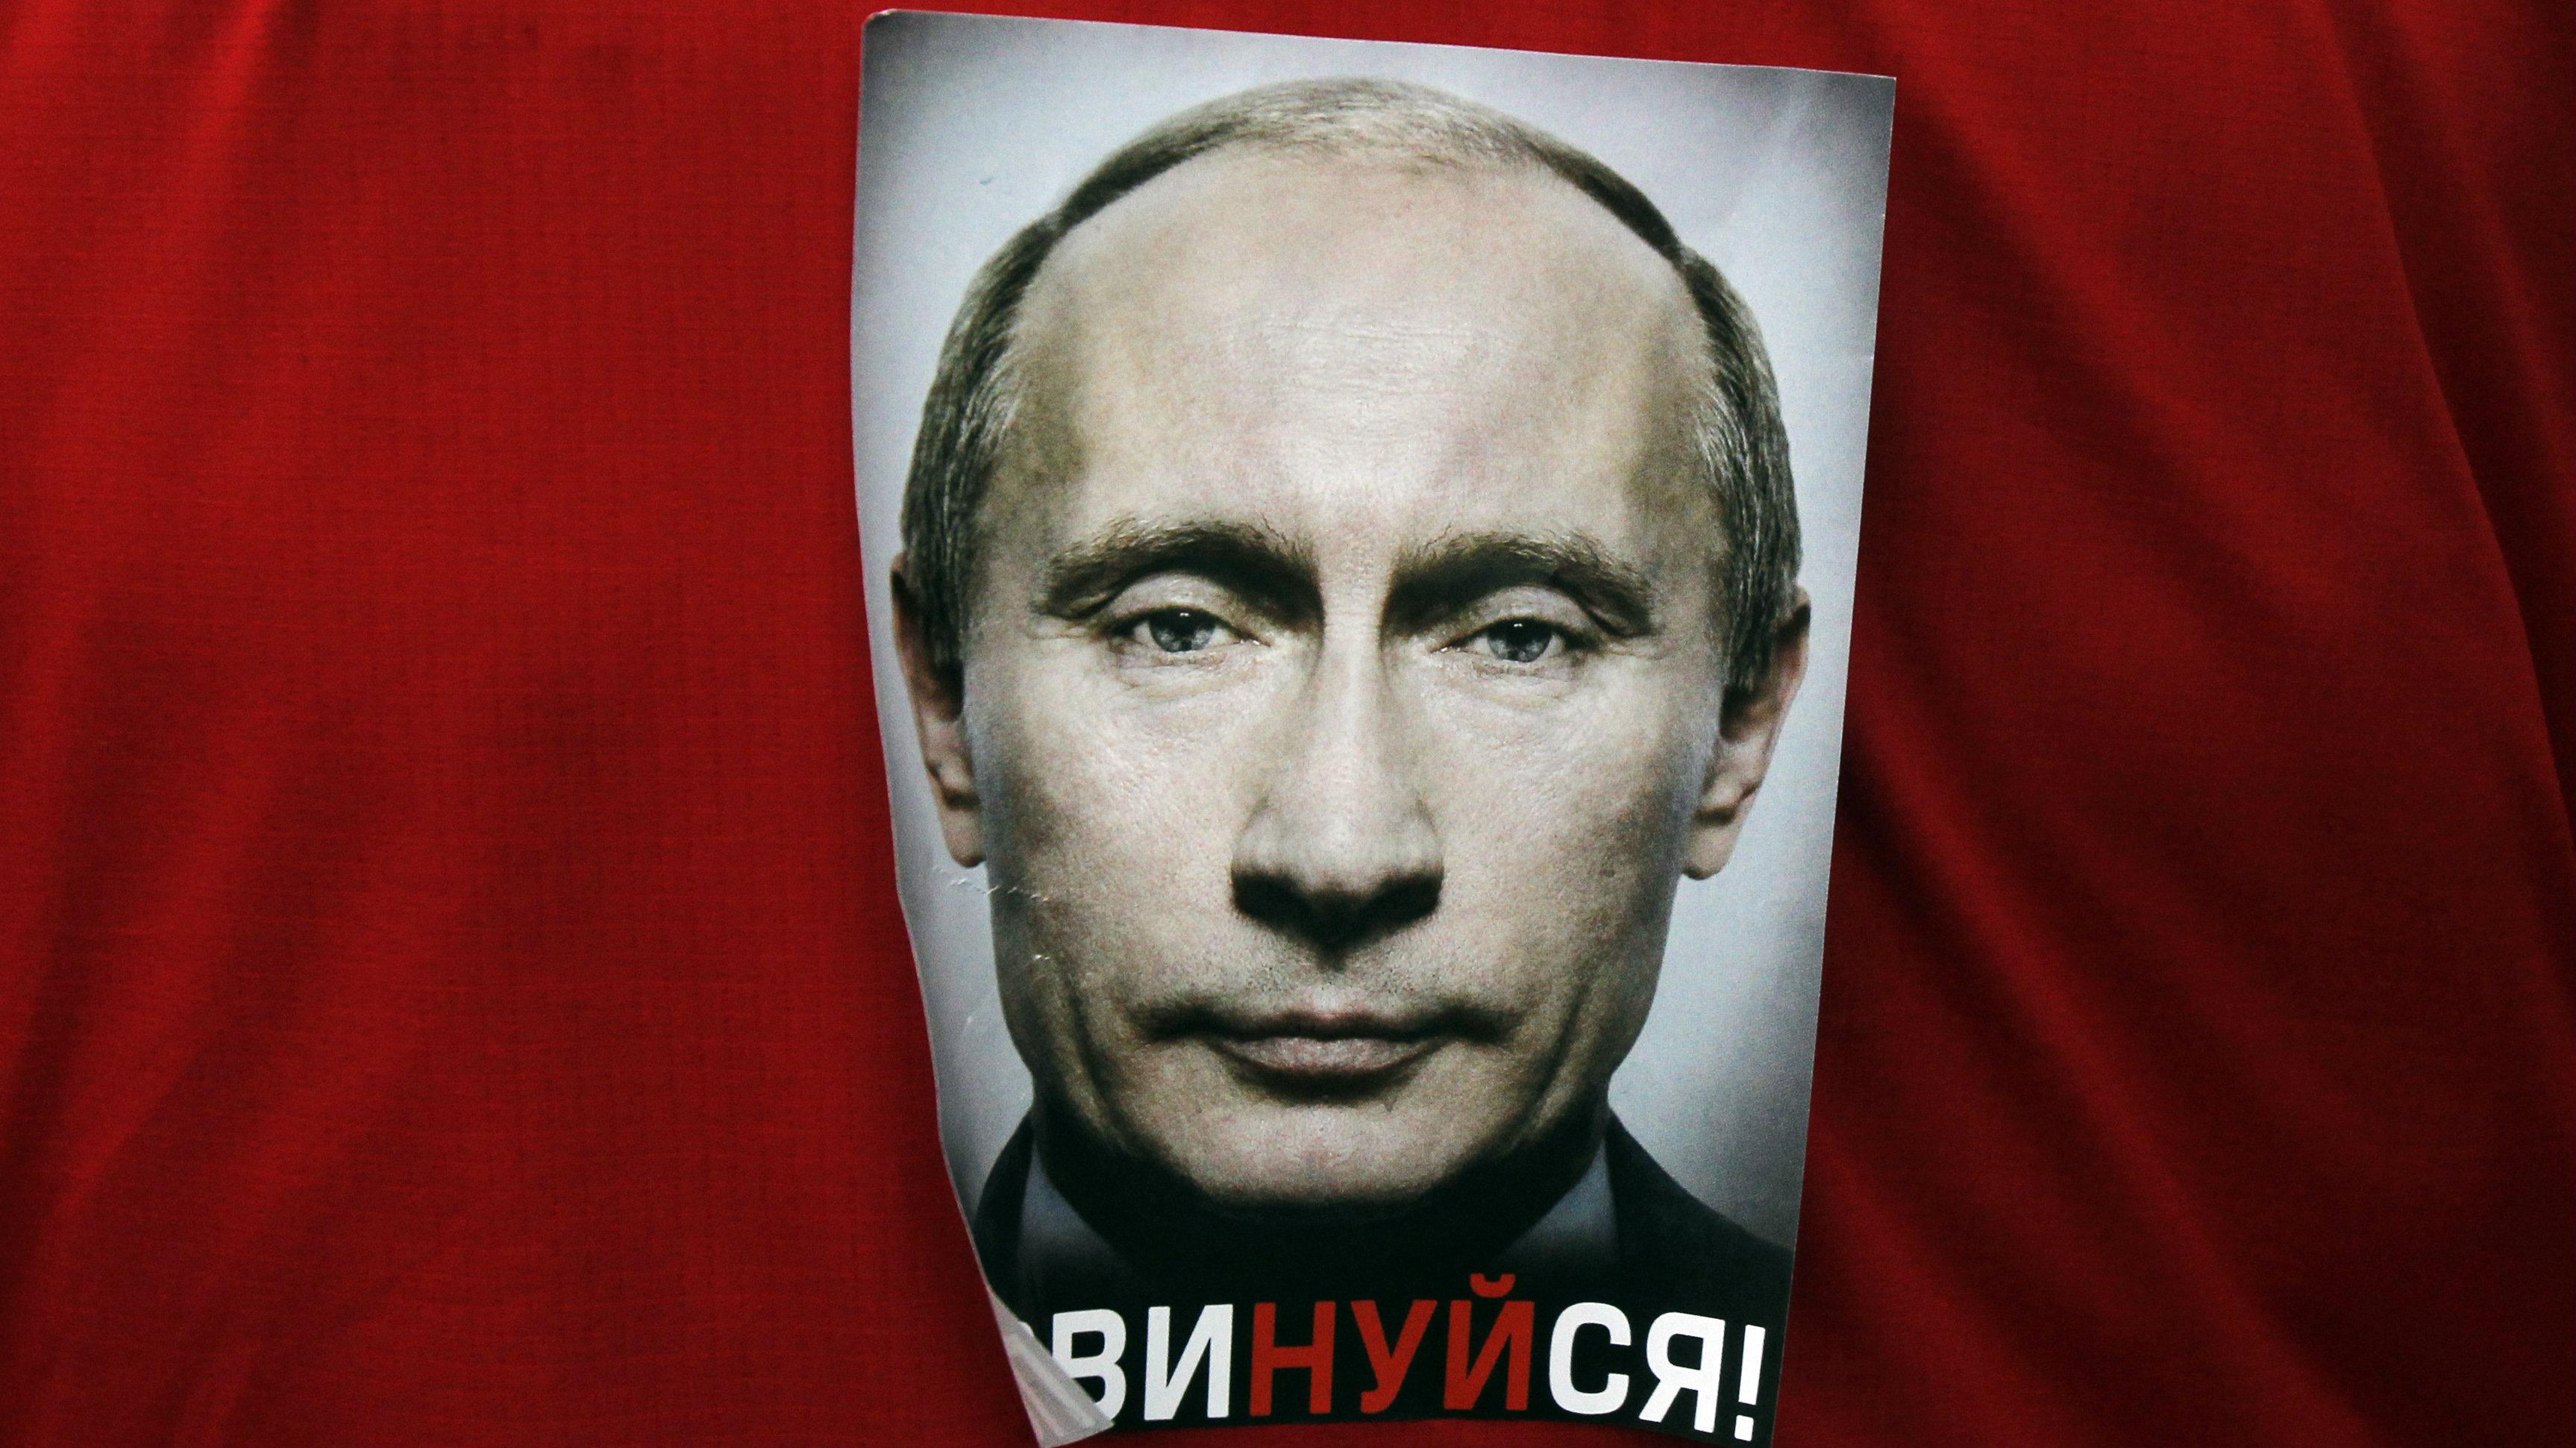 An image of Vladimir Putin